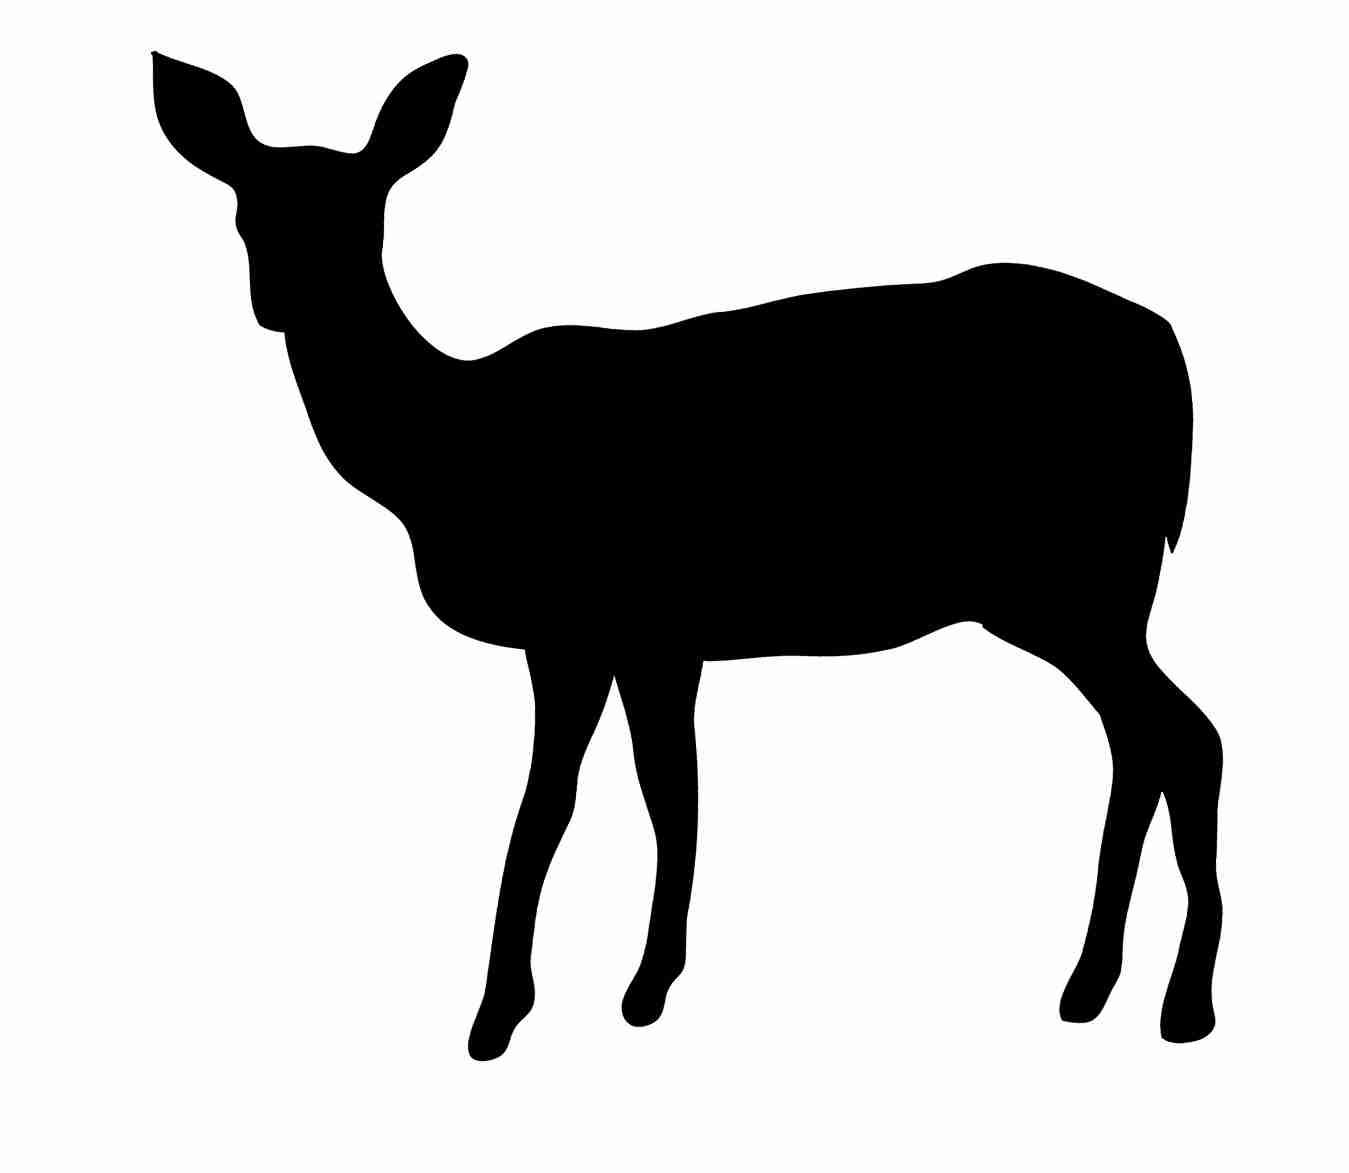 1349x1173 Free Deer Silhouette Download Clip Art On At Clipart Olegratiy